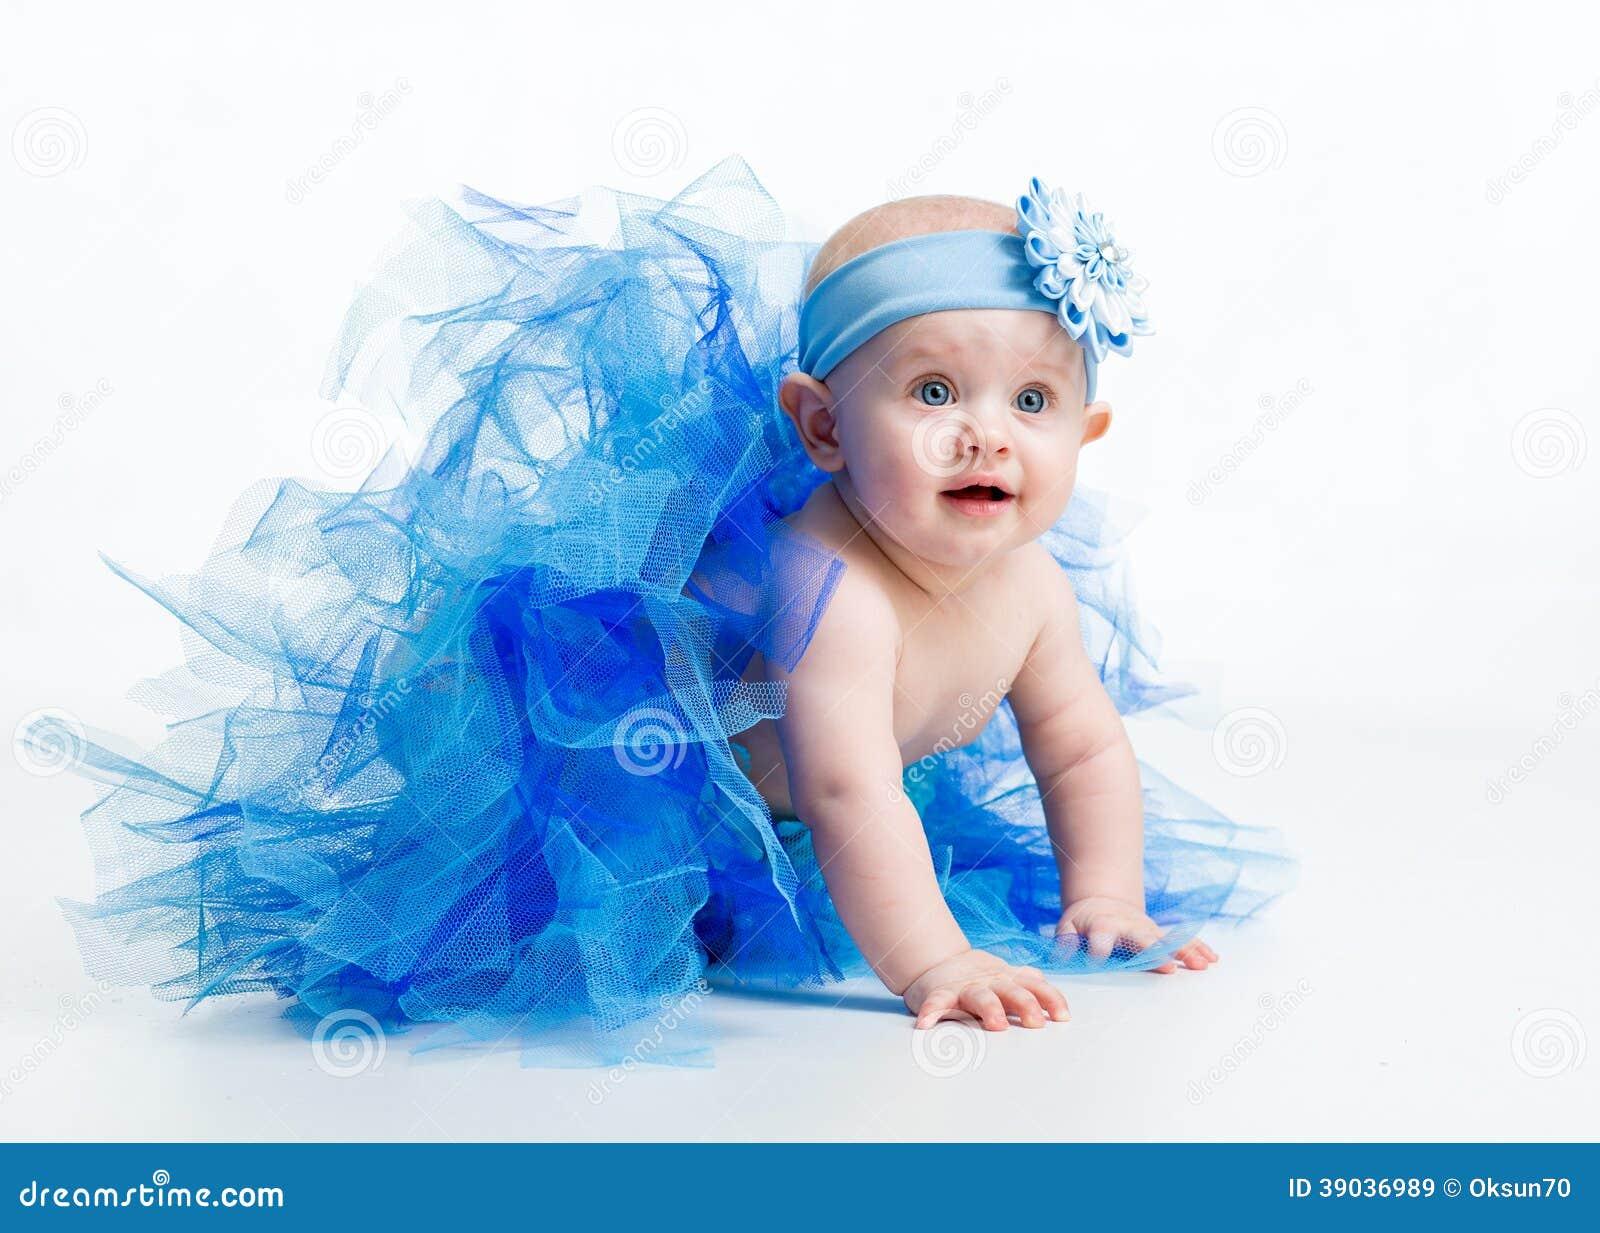 pretty baby girl weared tutu stock image - image of happy, beautiful